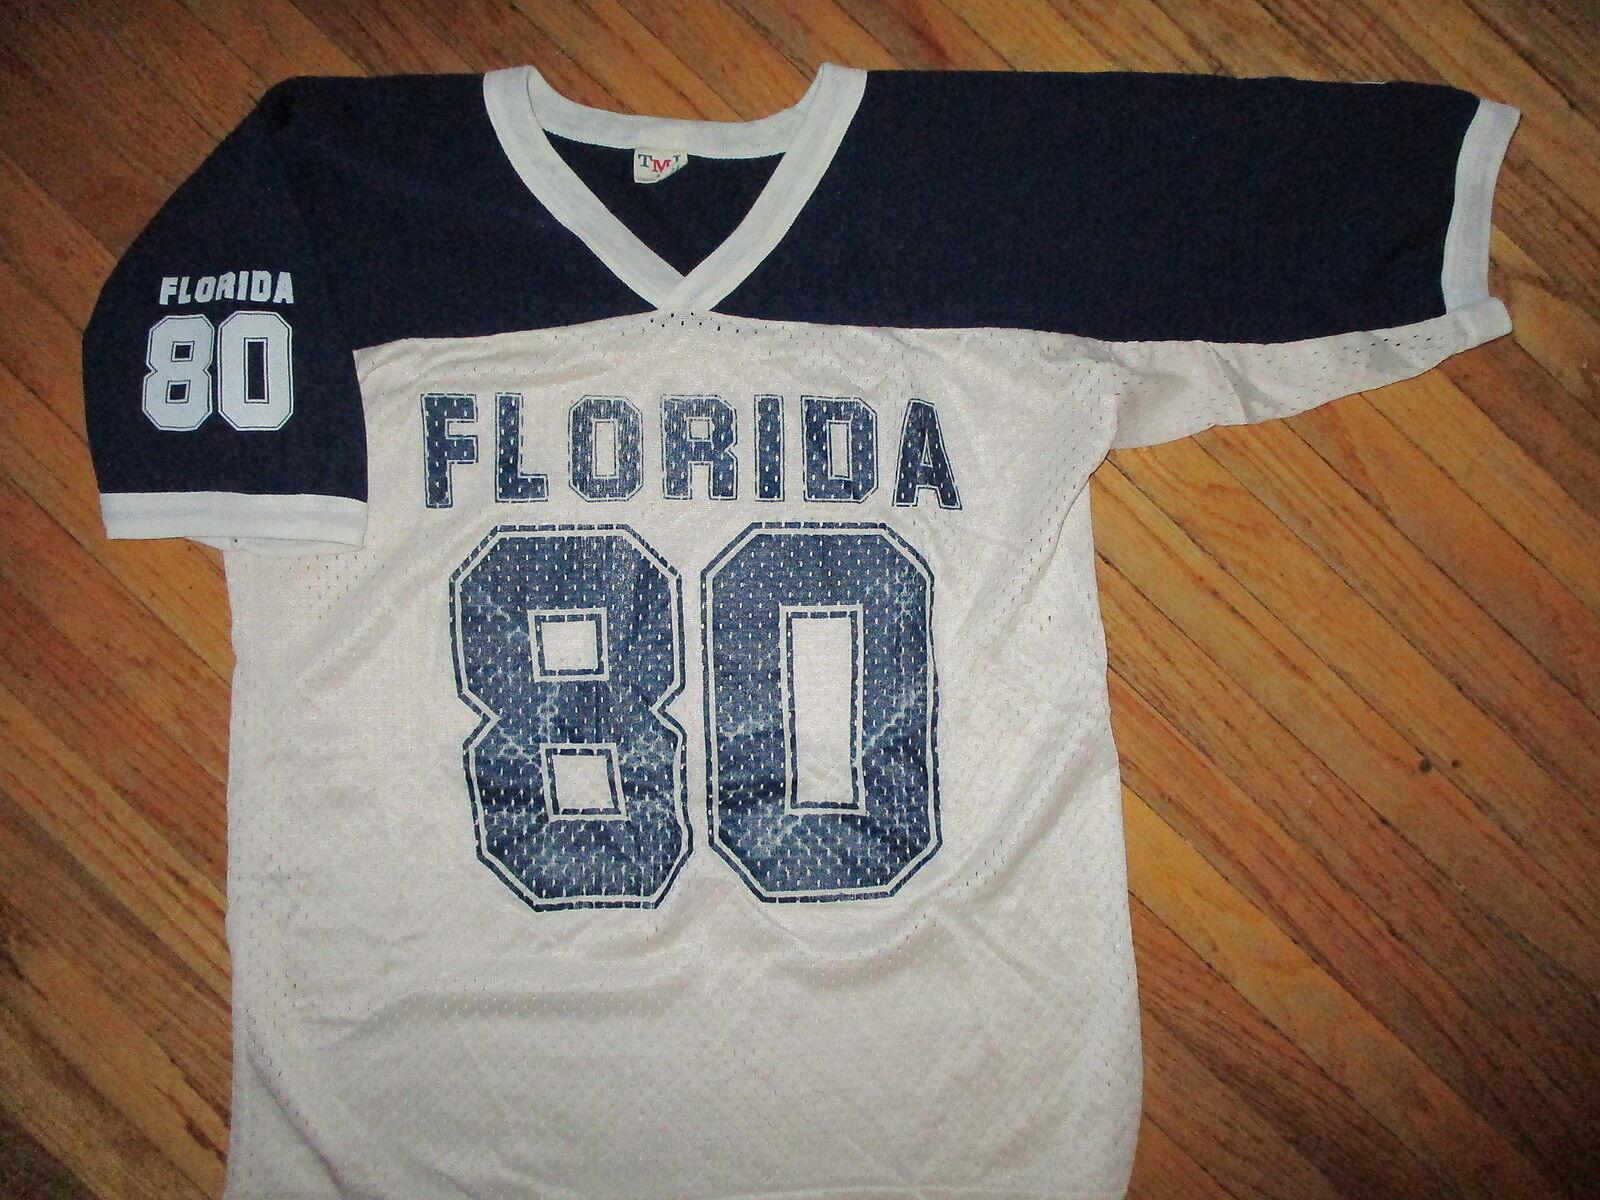 True vintage 1980 year florida 80 pullover blue white football mesh tmi-show original title